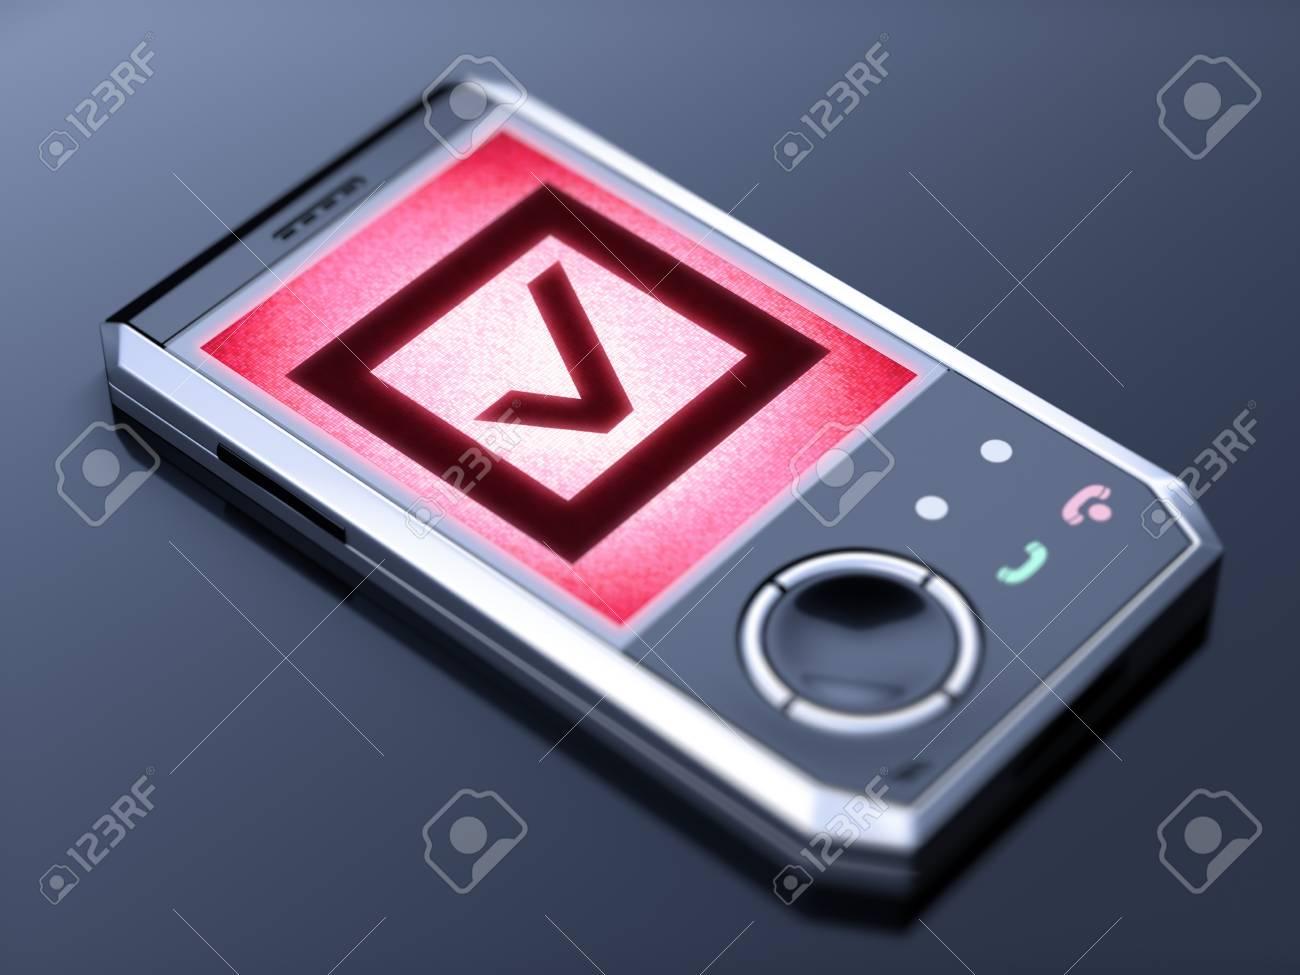 mobile phone Stock Photo - 10671977